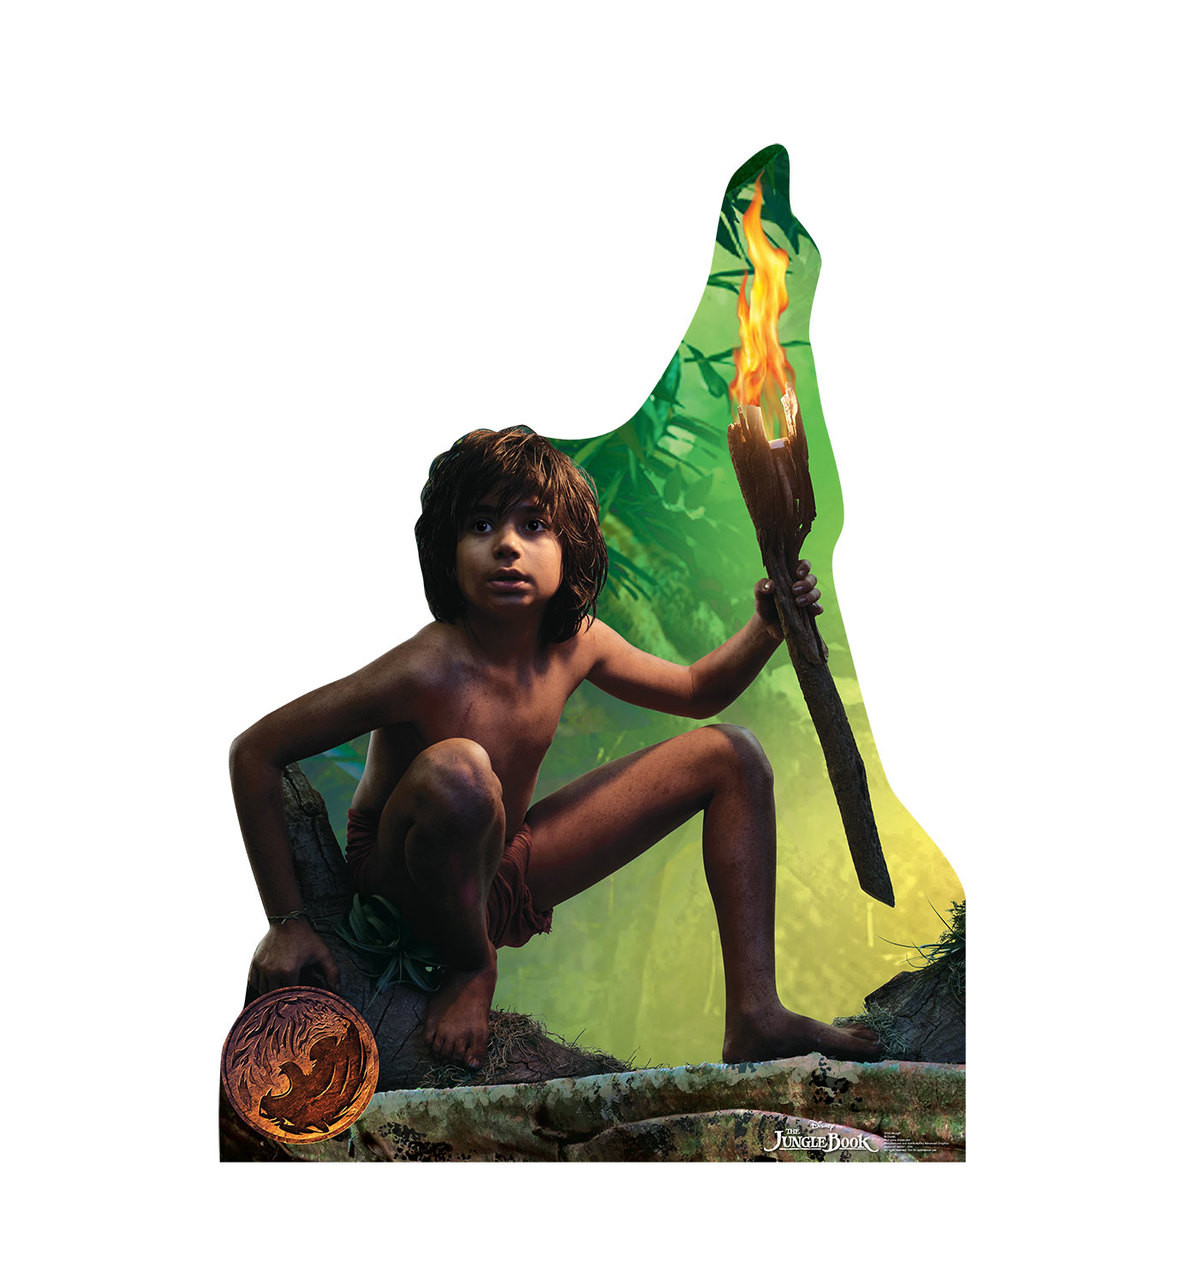 Life-size Mowgli - The Jungle Book Cardboard Standup